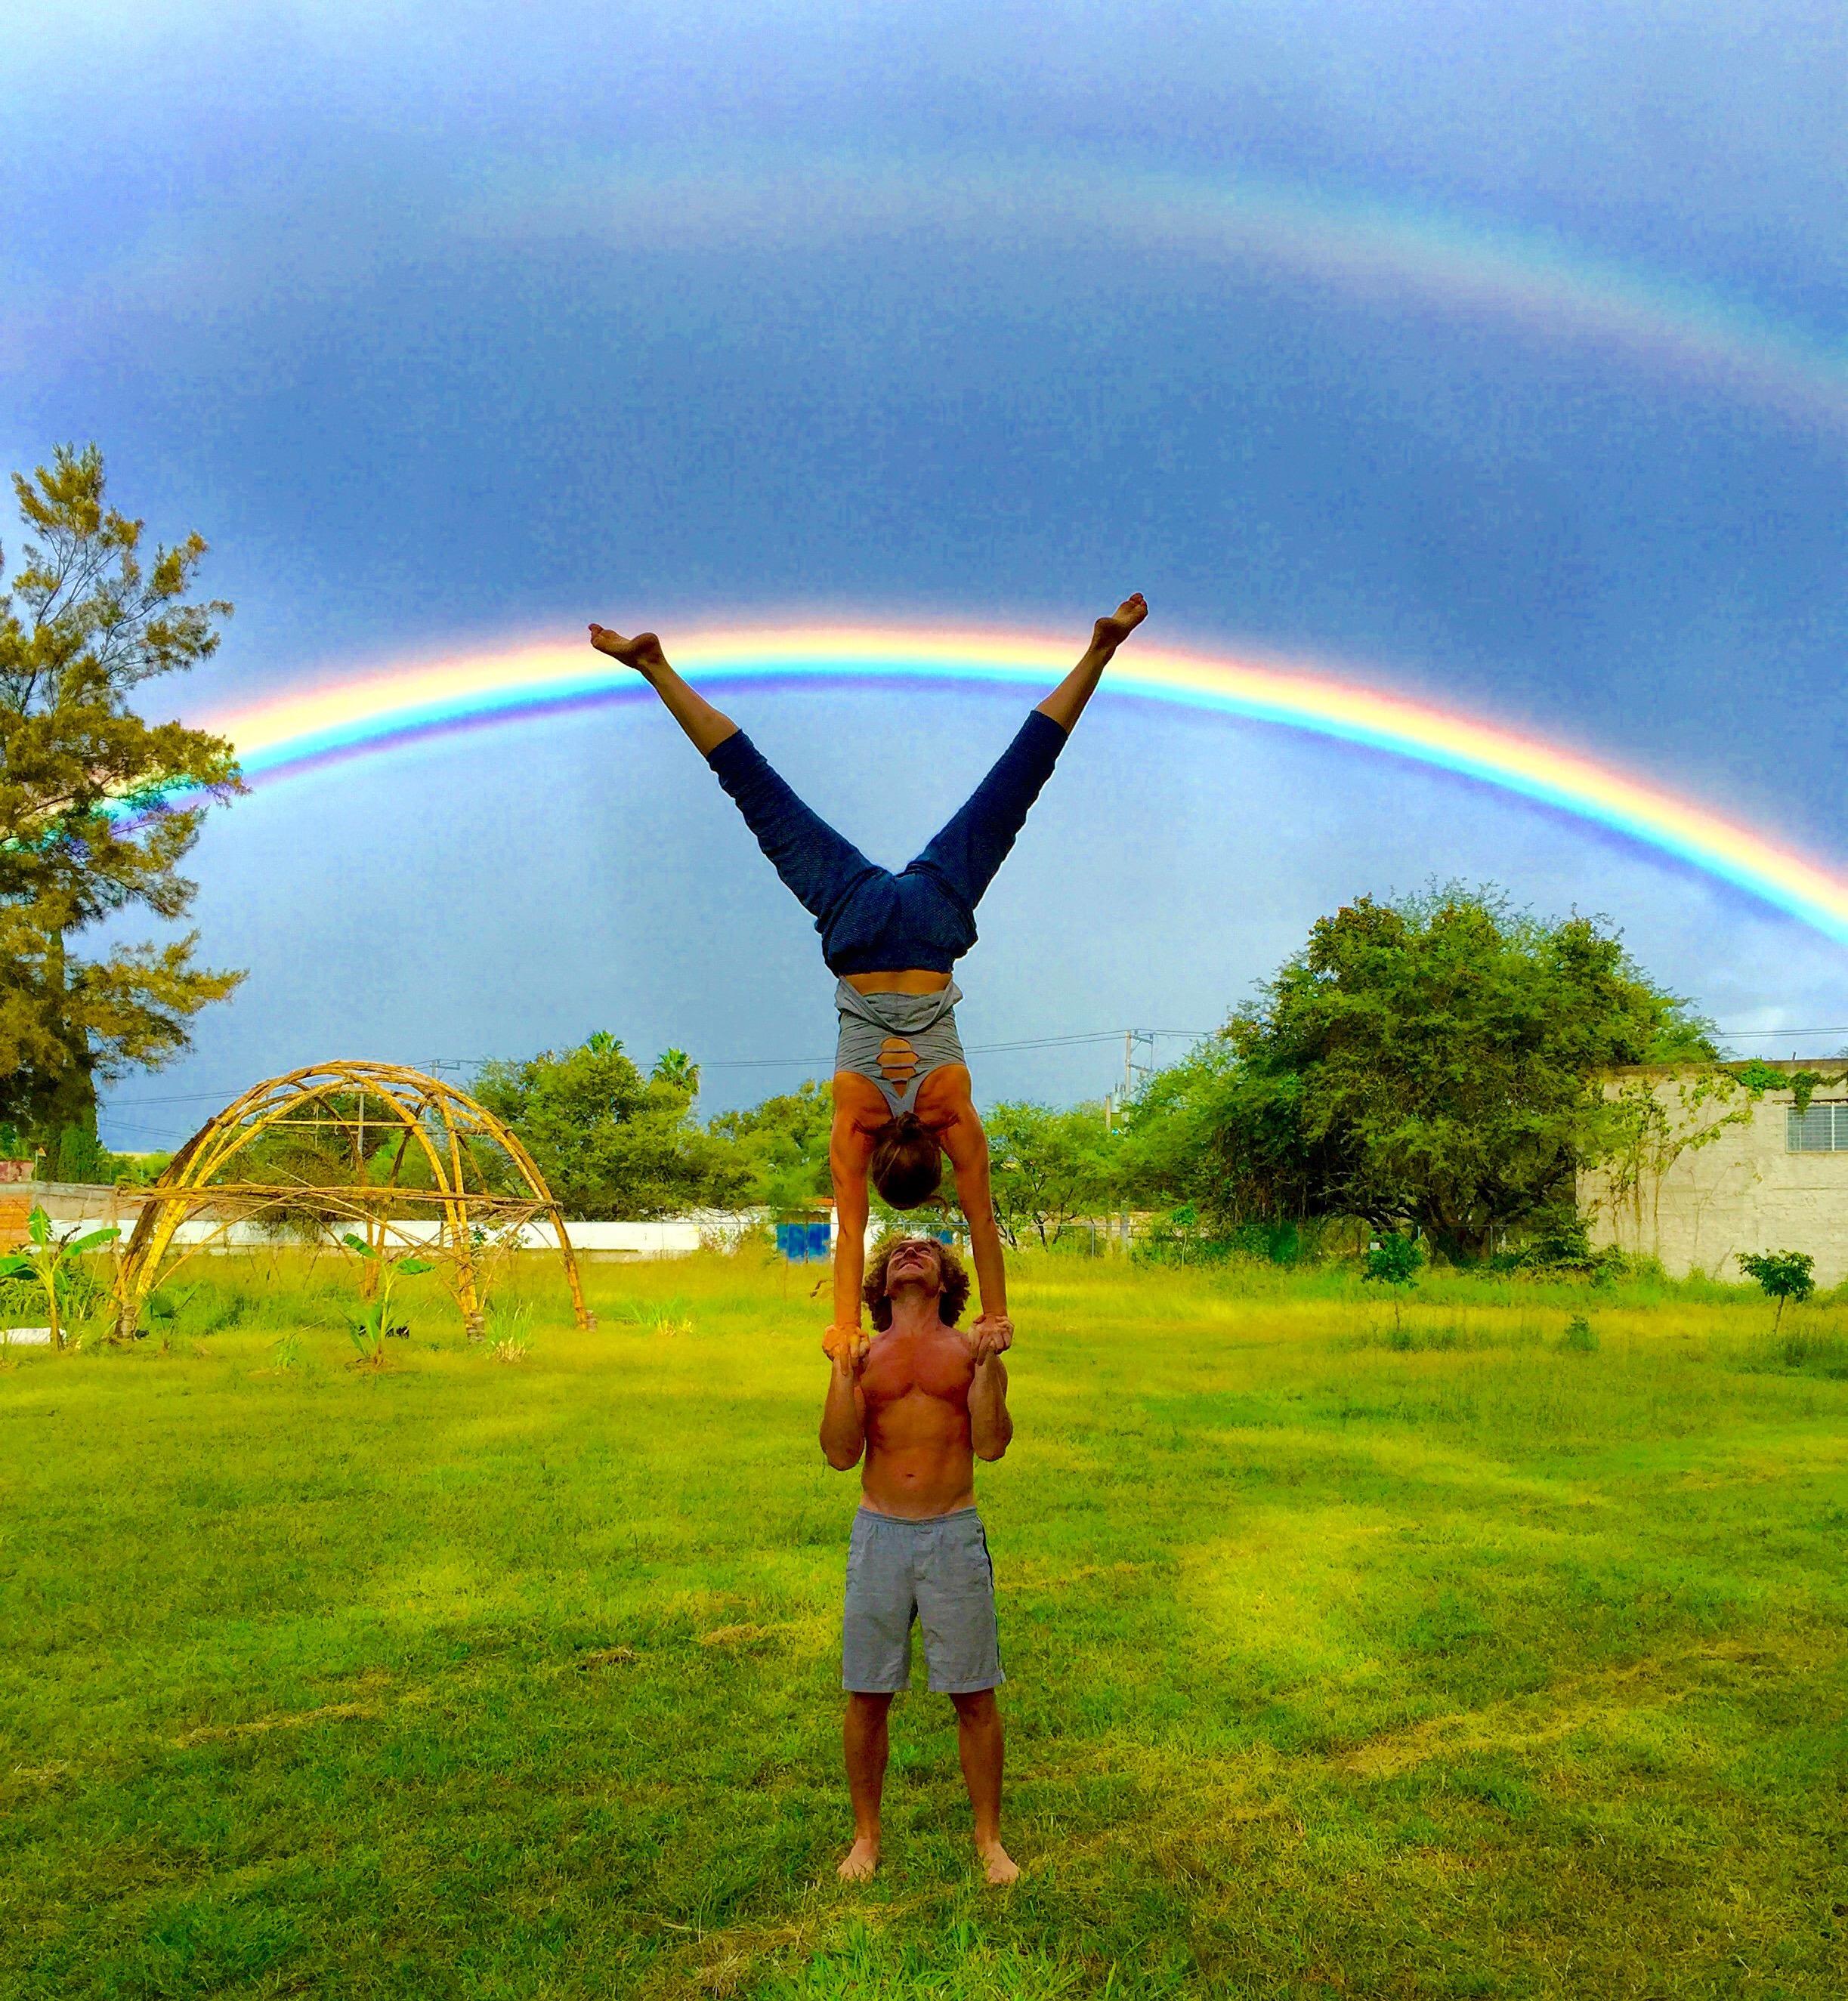 AcroYoga and Rainbows 3